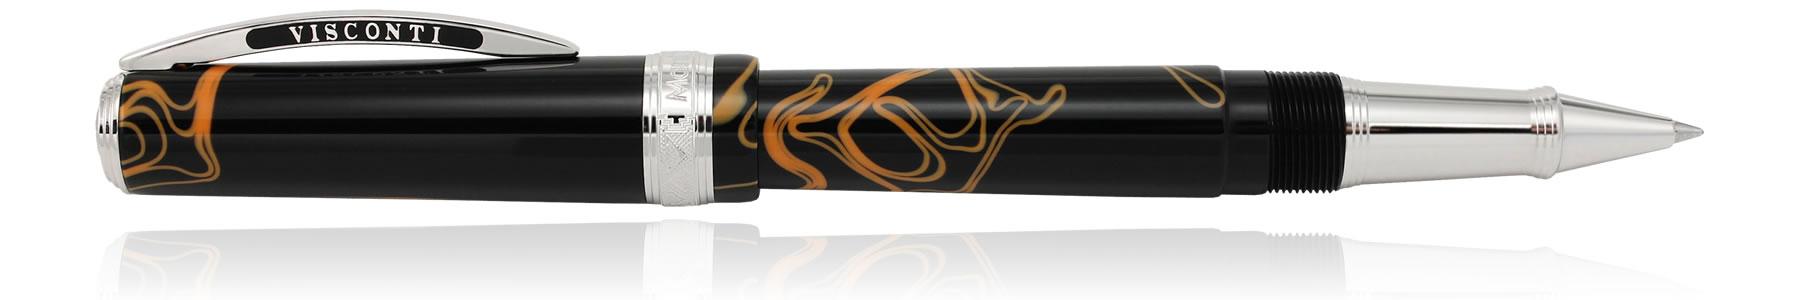 Visconti Manhattan Magma Fountain Pen